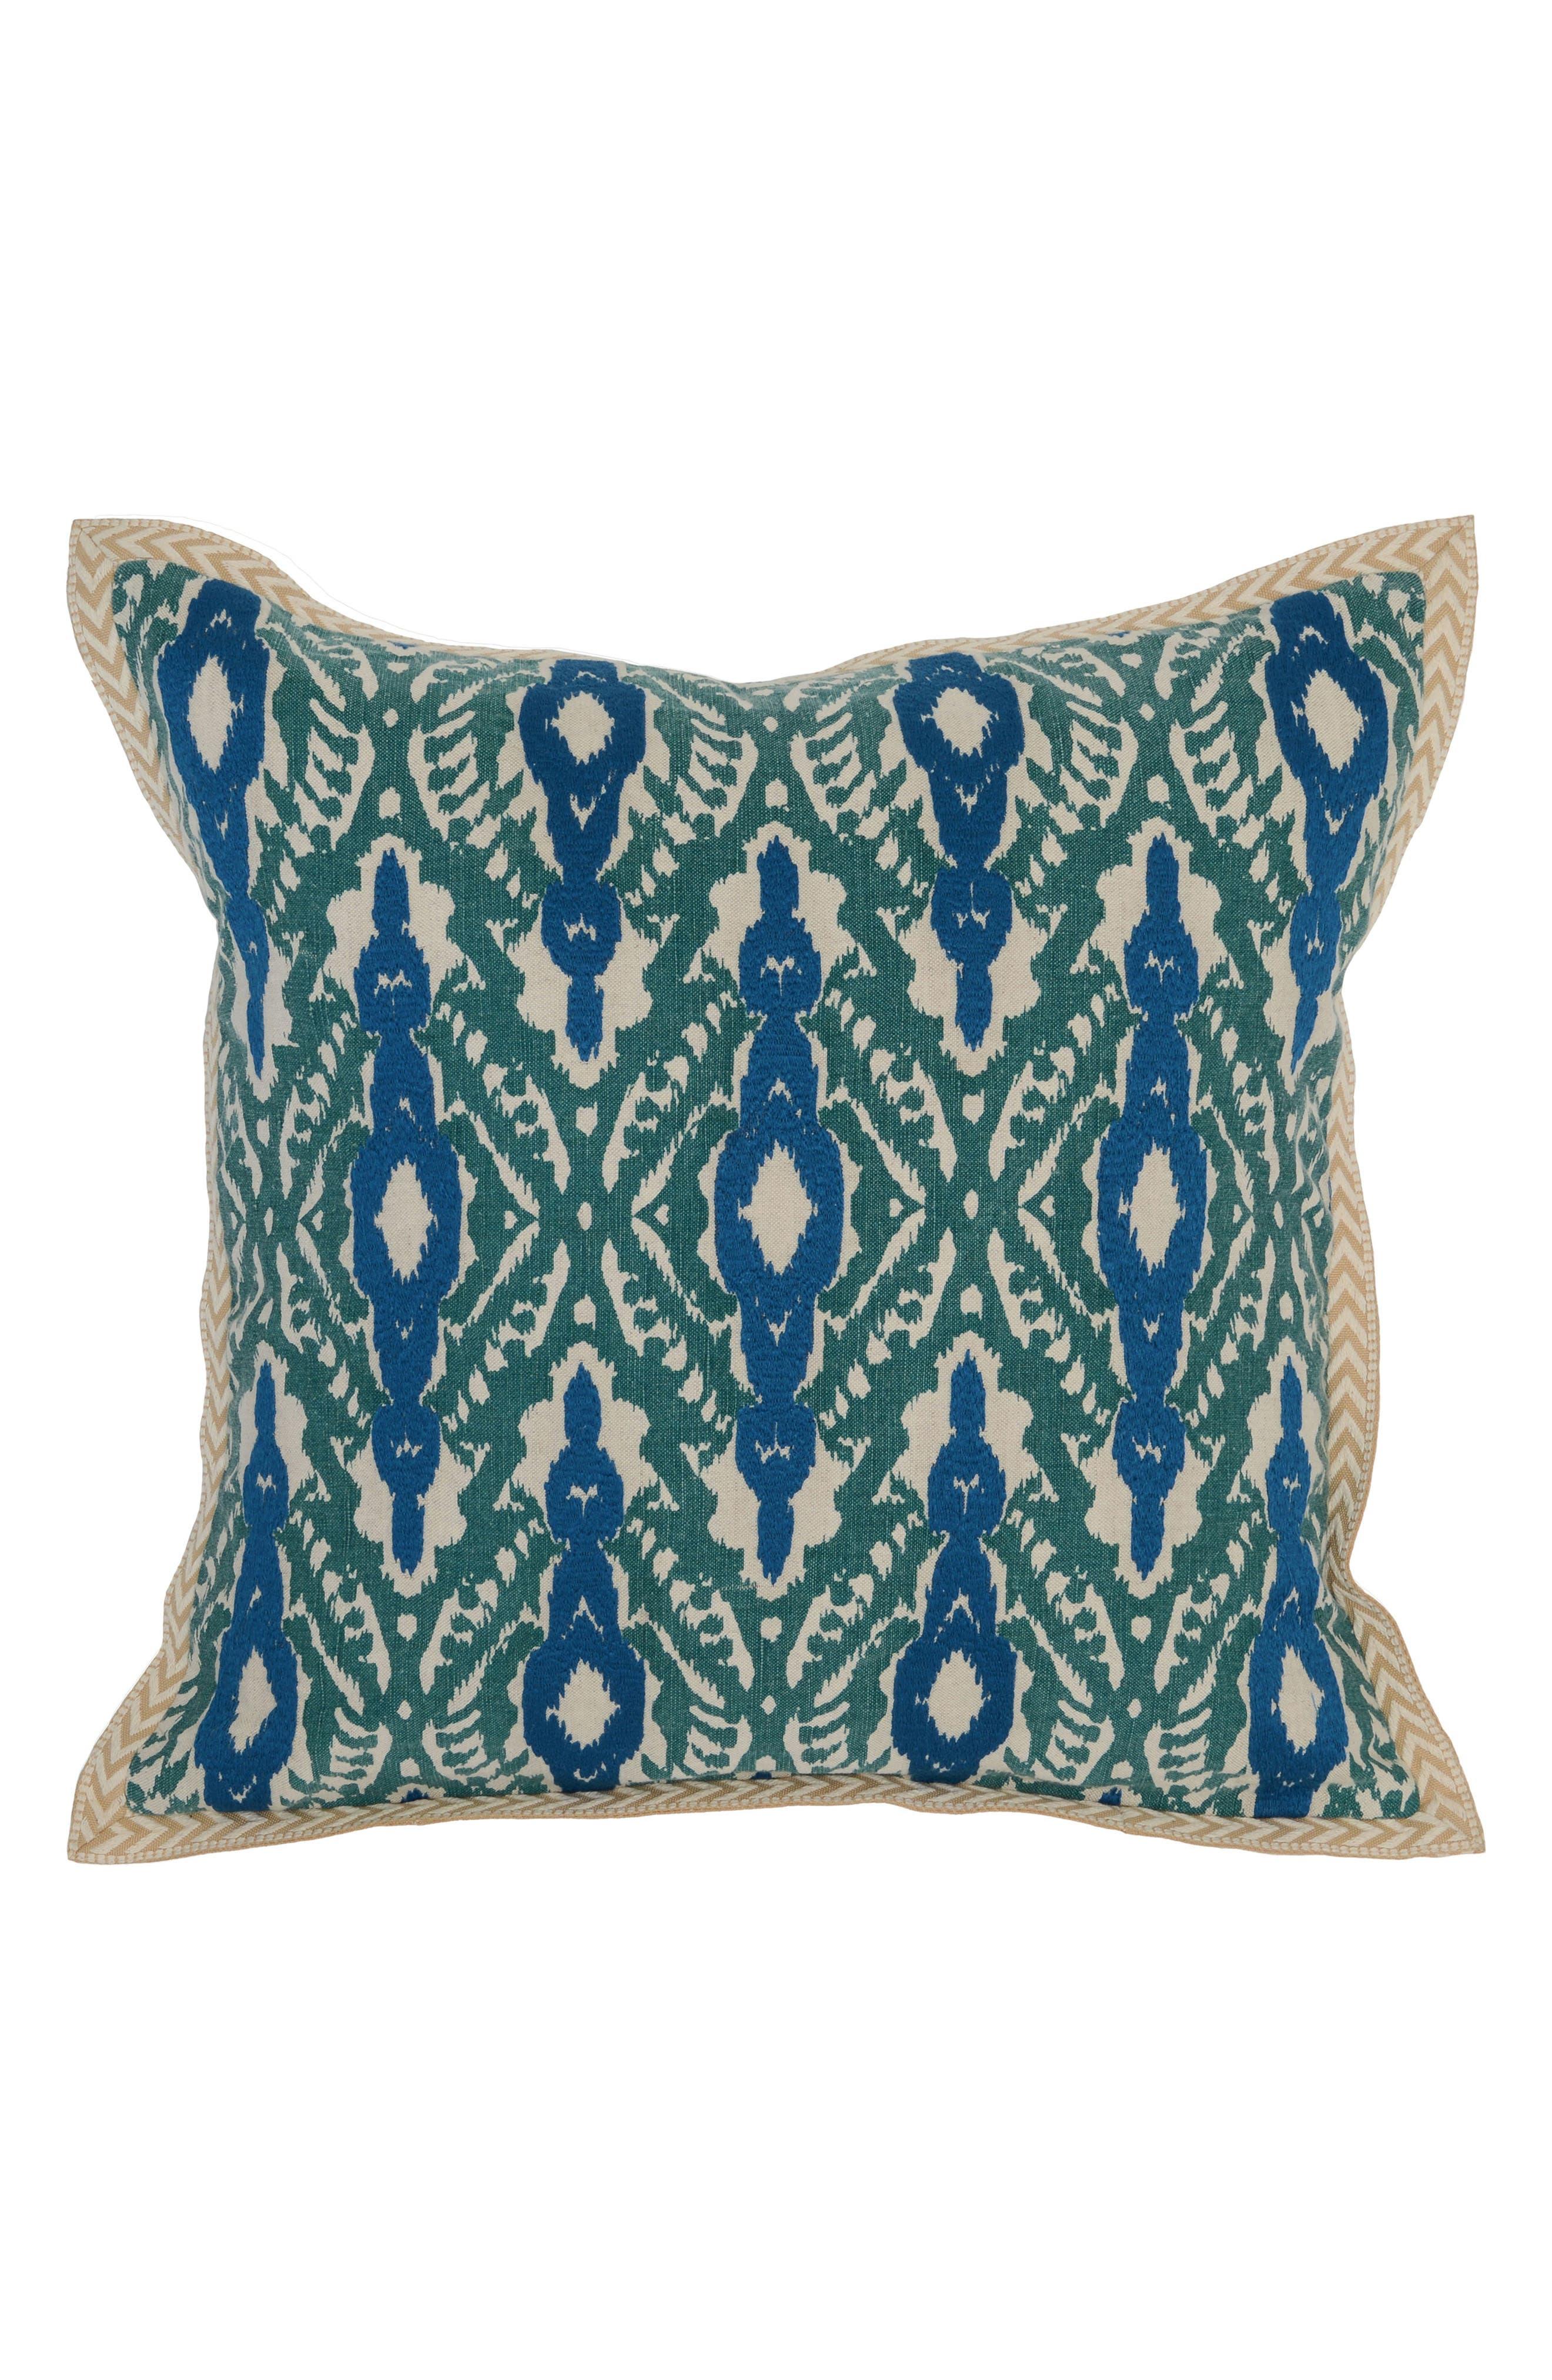 Bali Accent Pillow,                         Main,                         color, 400